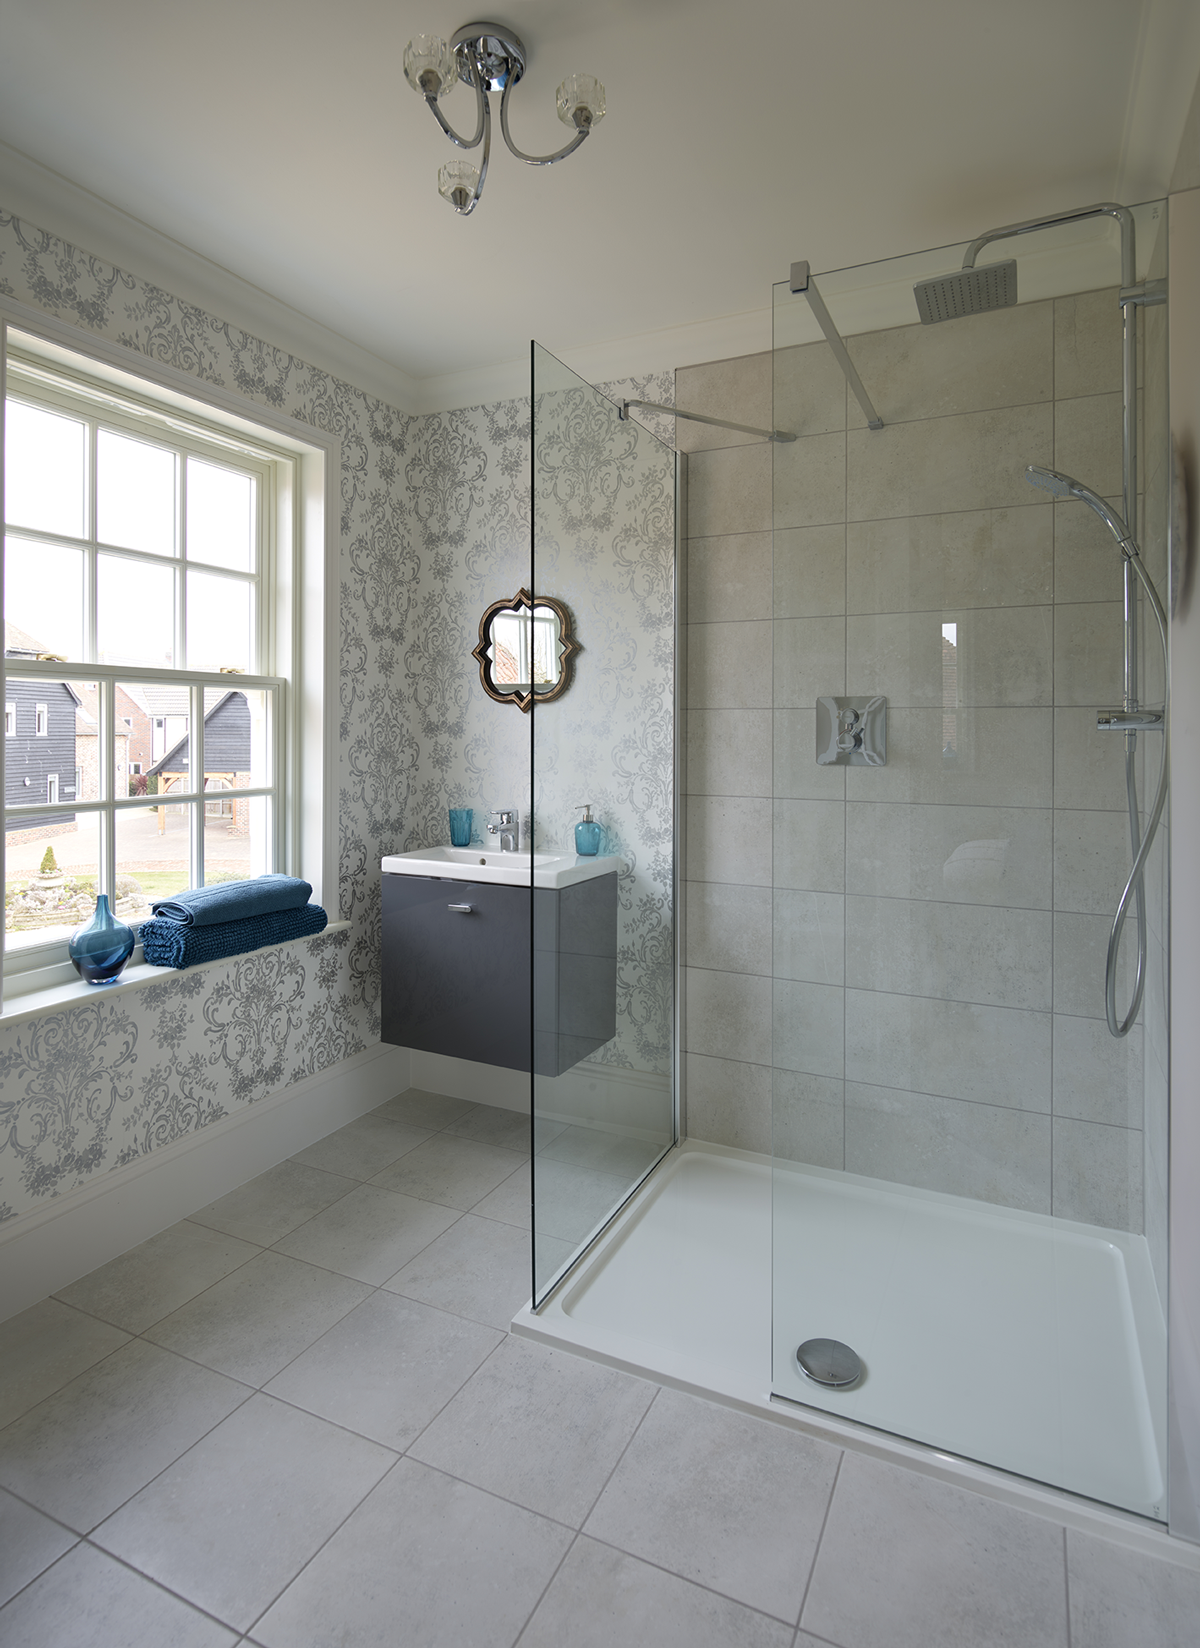 Hd Novel Light Grey Ceramic Matt Floor Tile British Ceramic Tile Specification Large Bathrooms Shower Cubicles Ceramic Matt